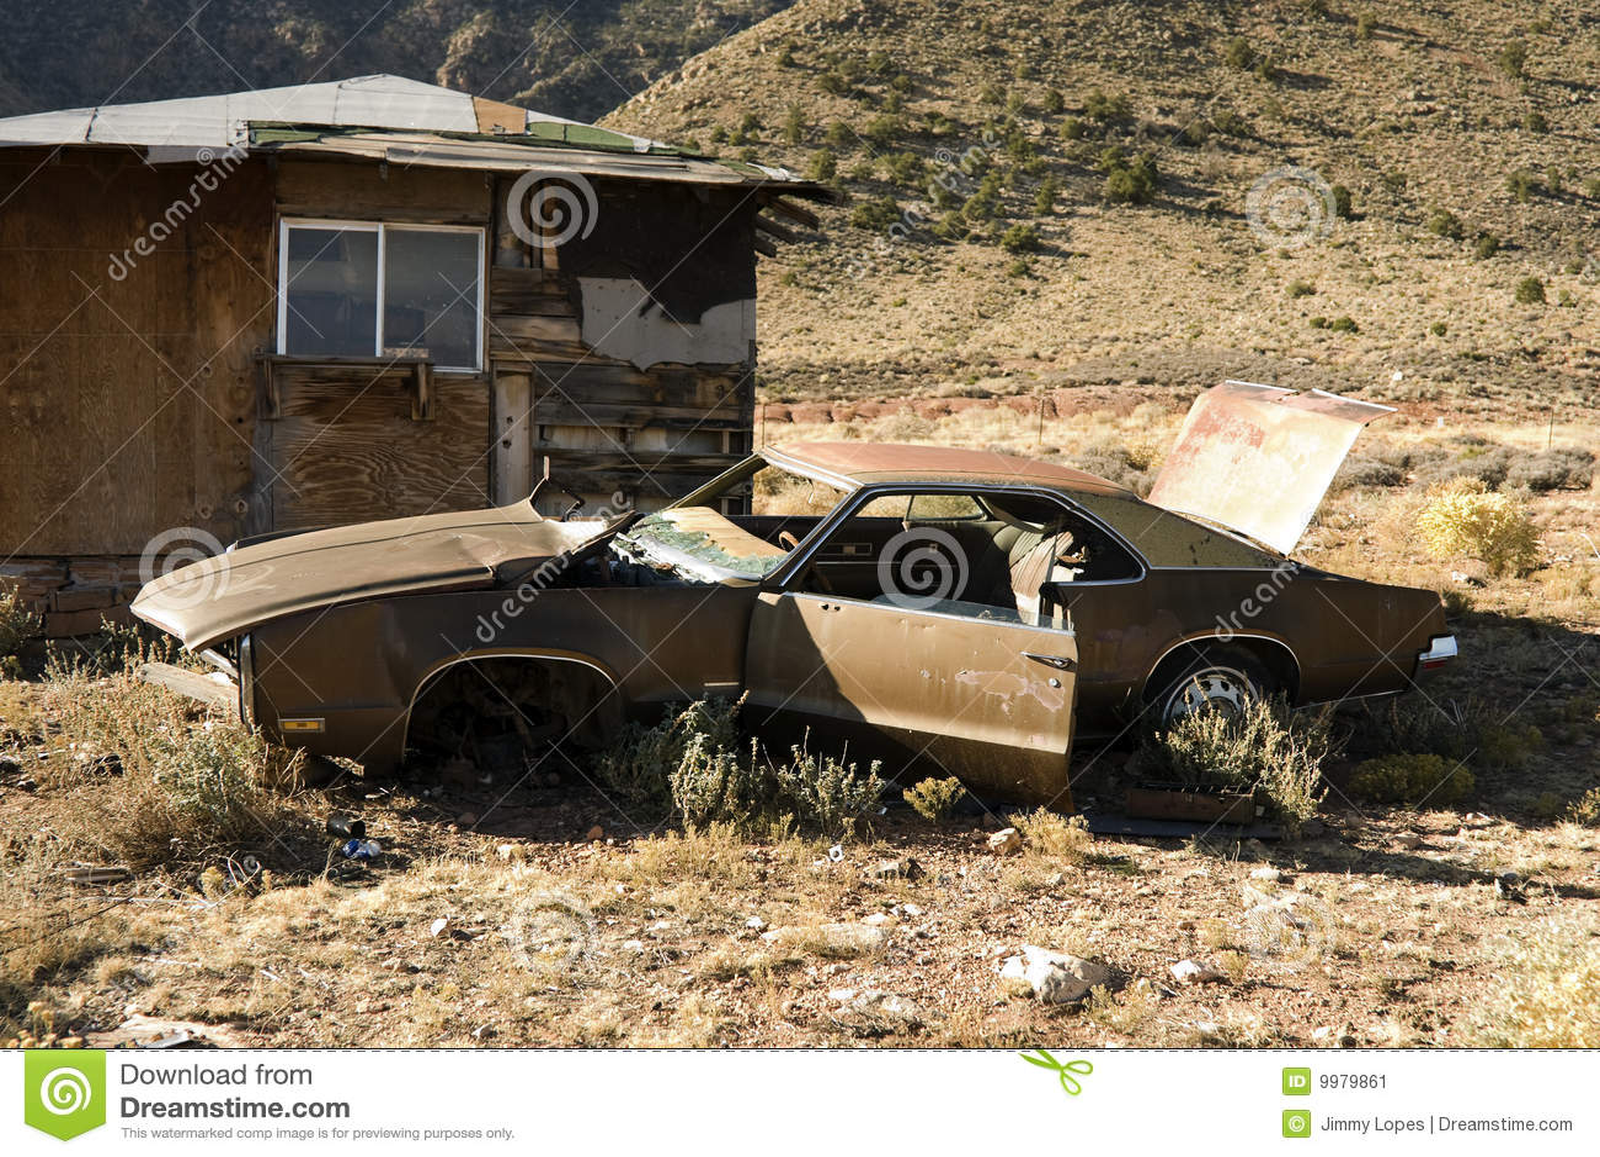 Abandoned Junk Car In Desert Stock Image - Image of abandoned ...